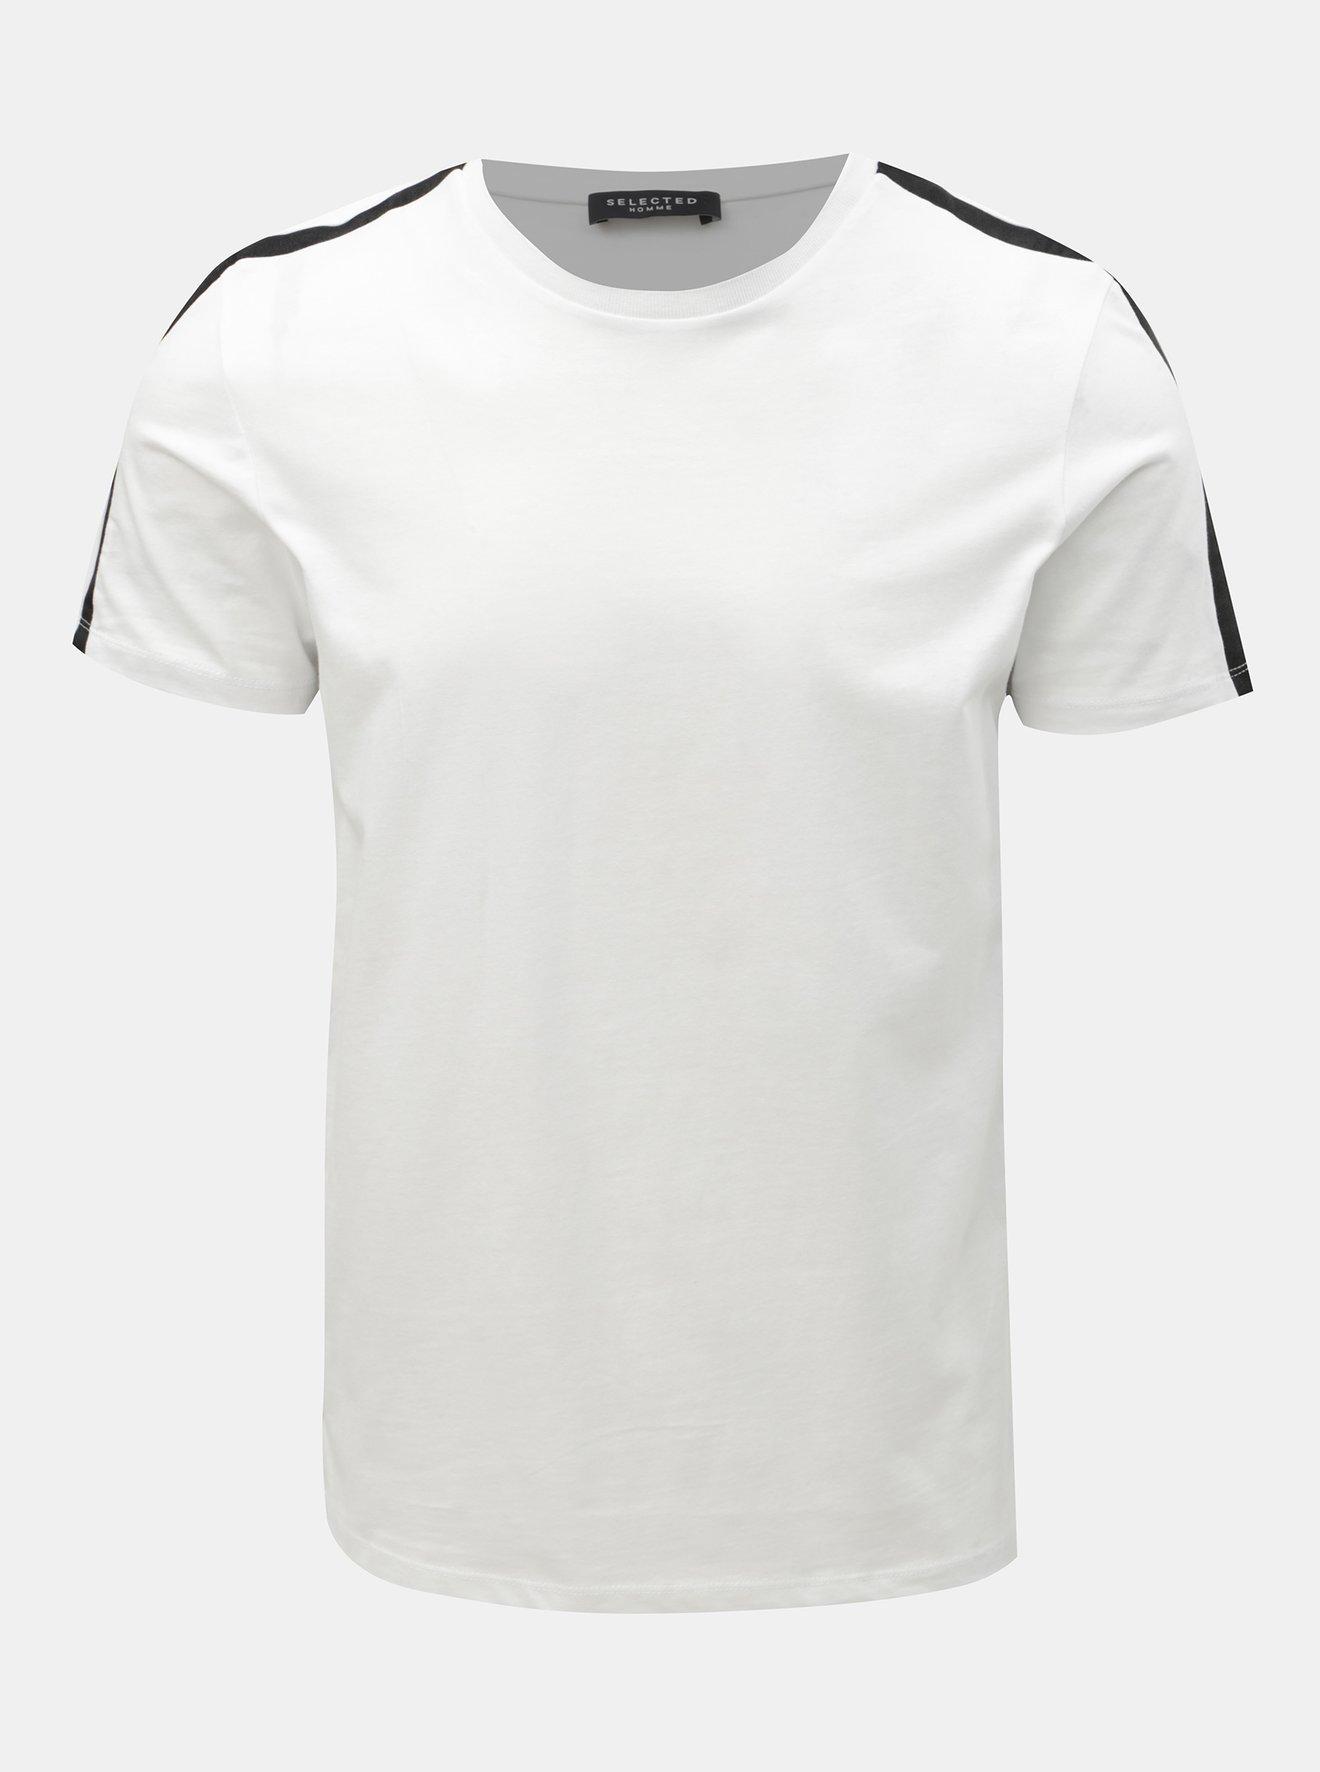 fdc029ff56f0 Bílé tričko Selected Homme Rib - SLEVA!